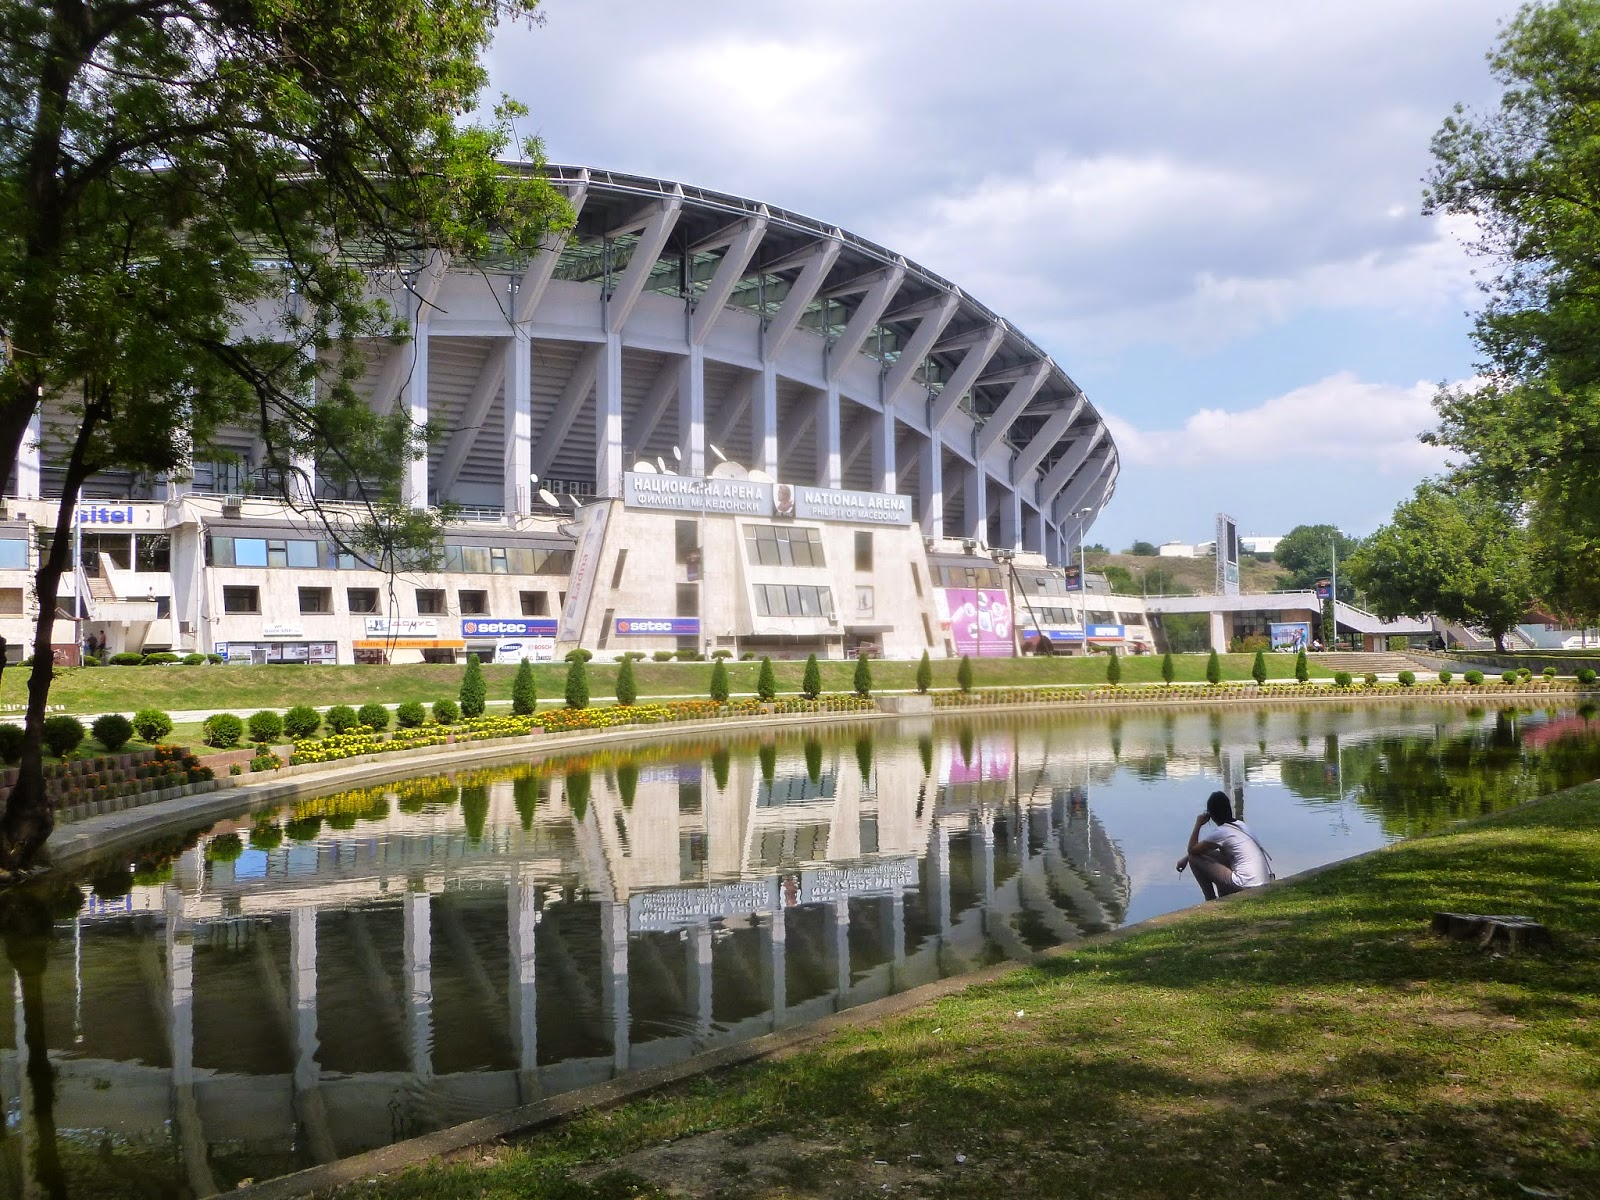 Another angle; photo: Kde Je Stadion